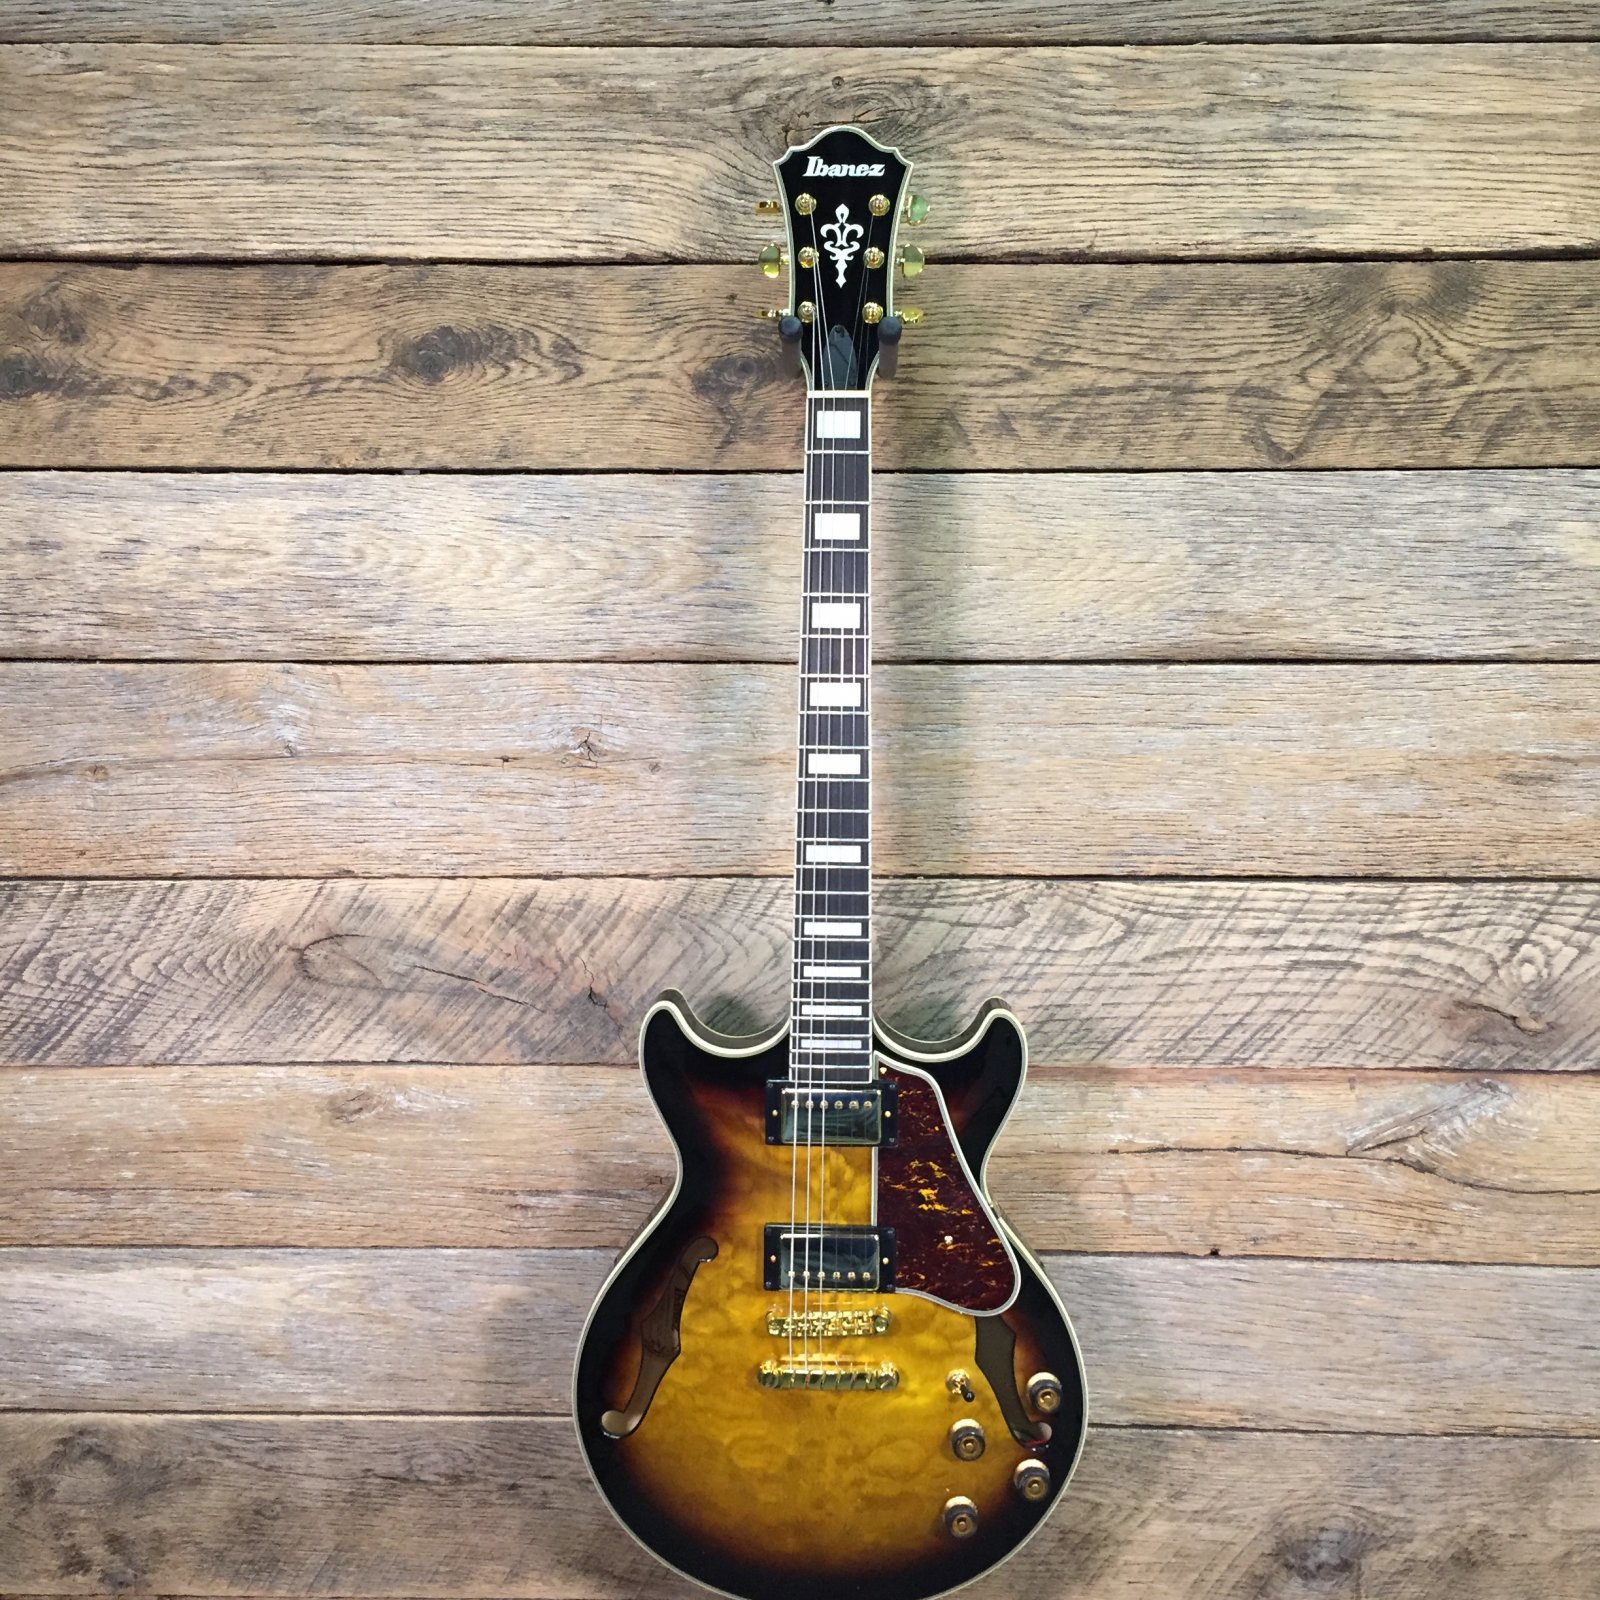 Ibanez AM93QM-AYS Hollow Body Guitar